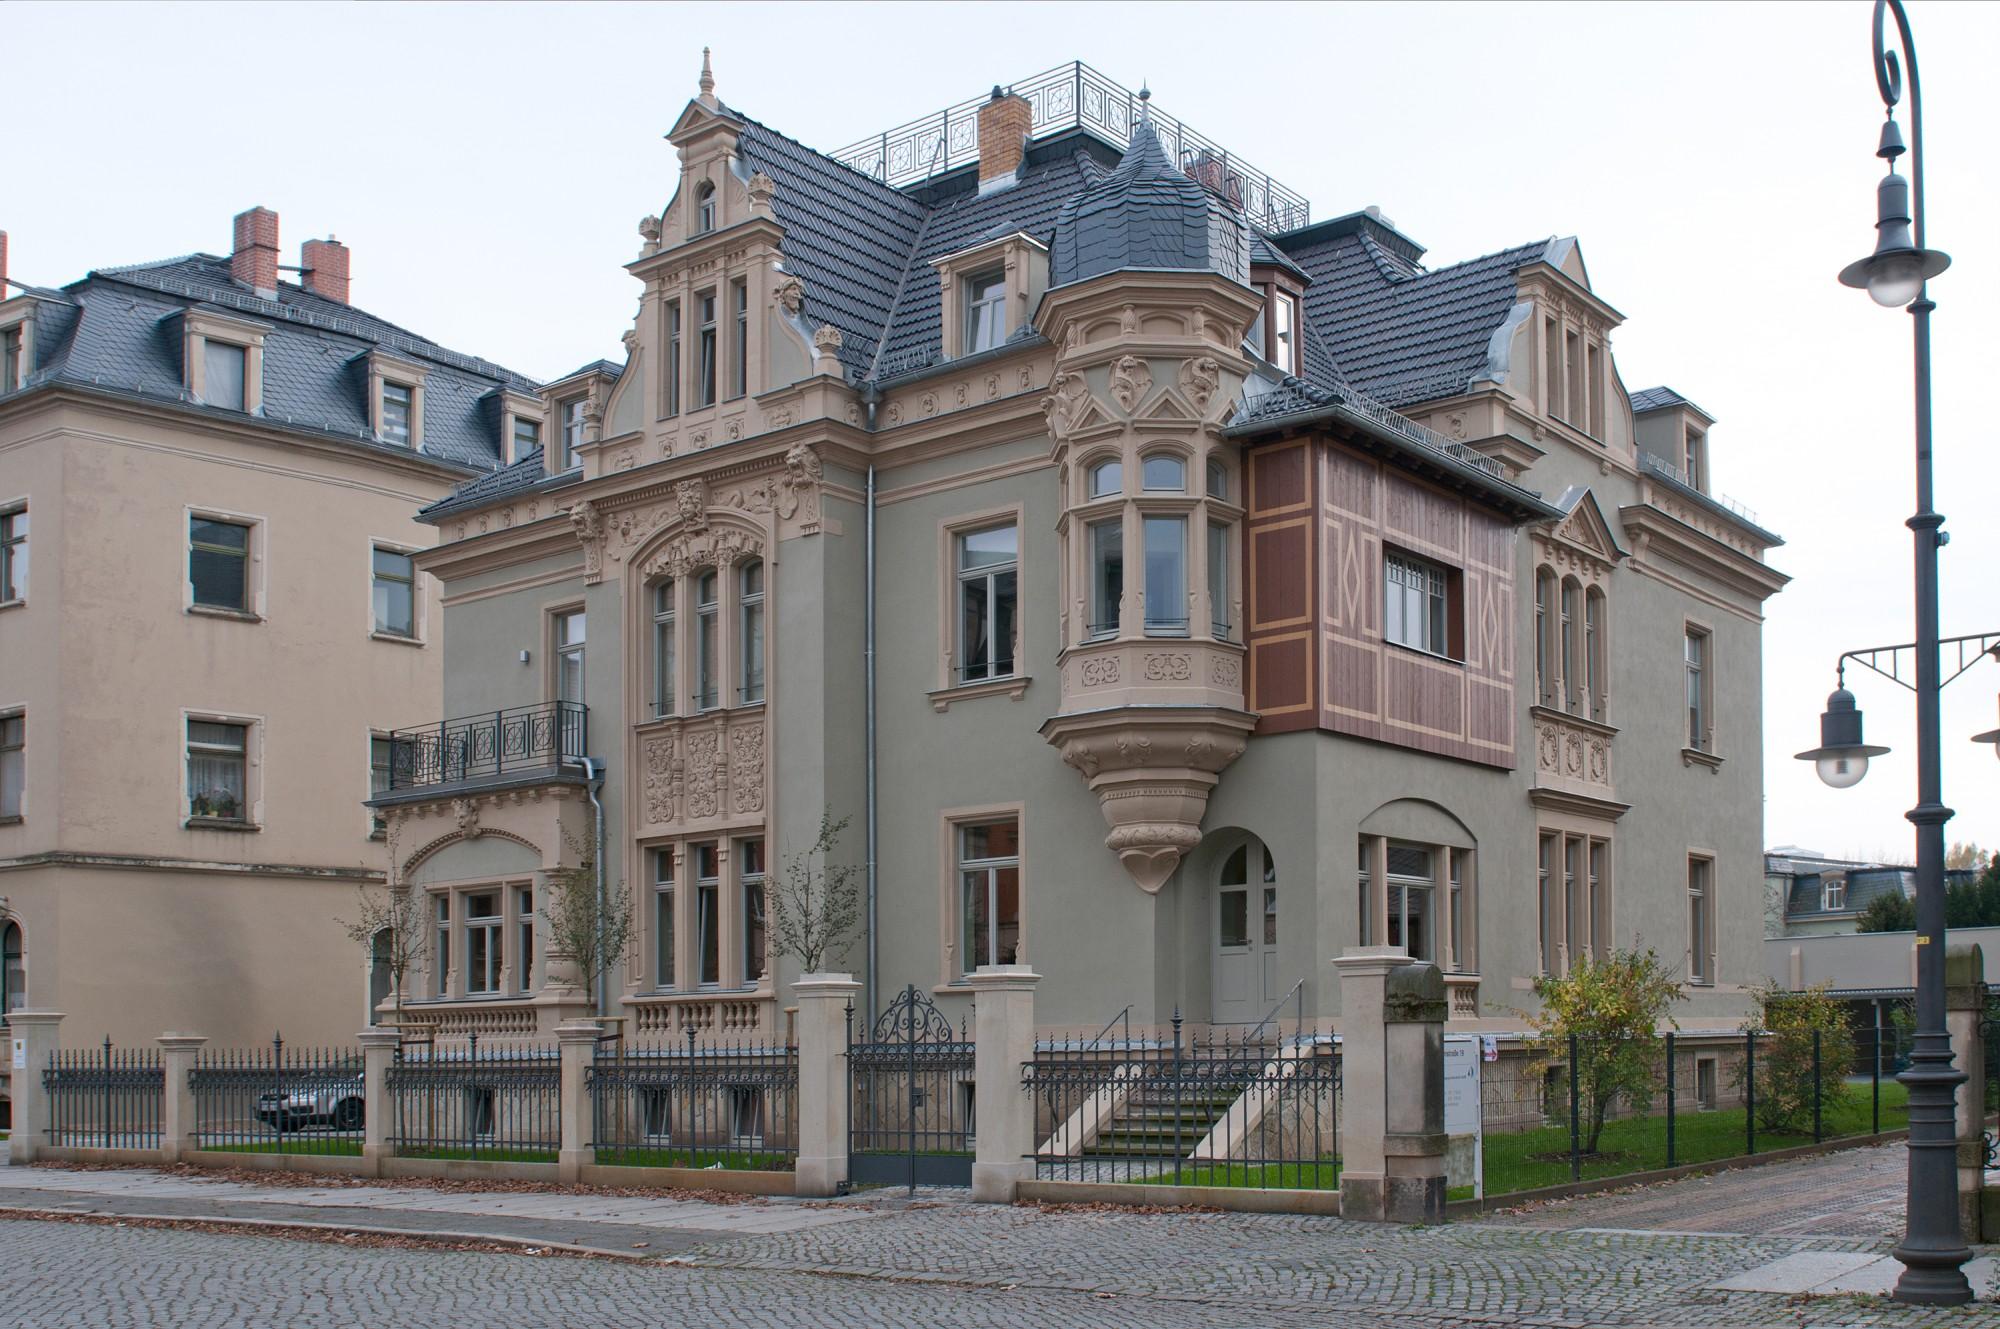 Villa gartenstra e seidel architekten - Seidel architekten ...